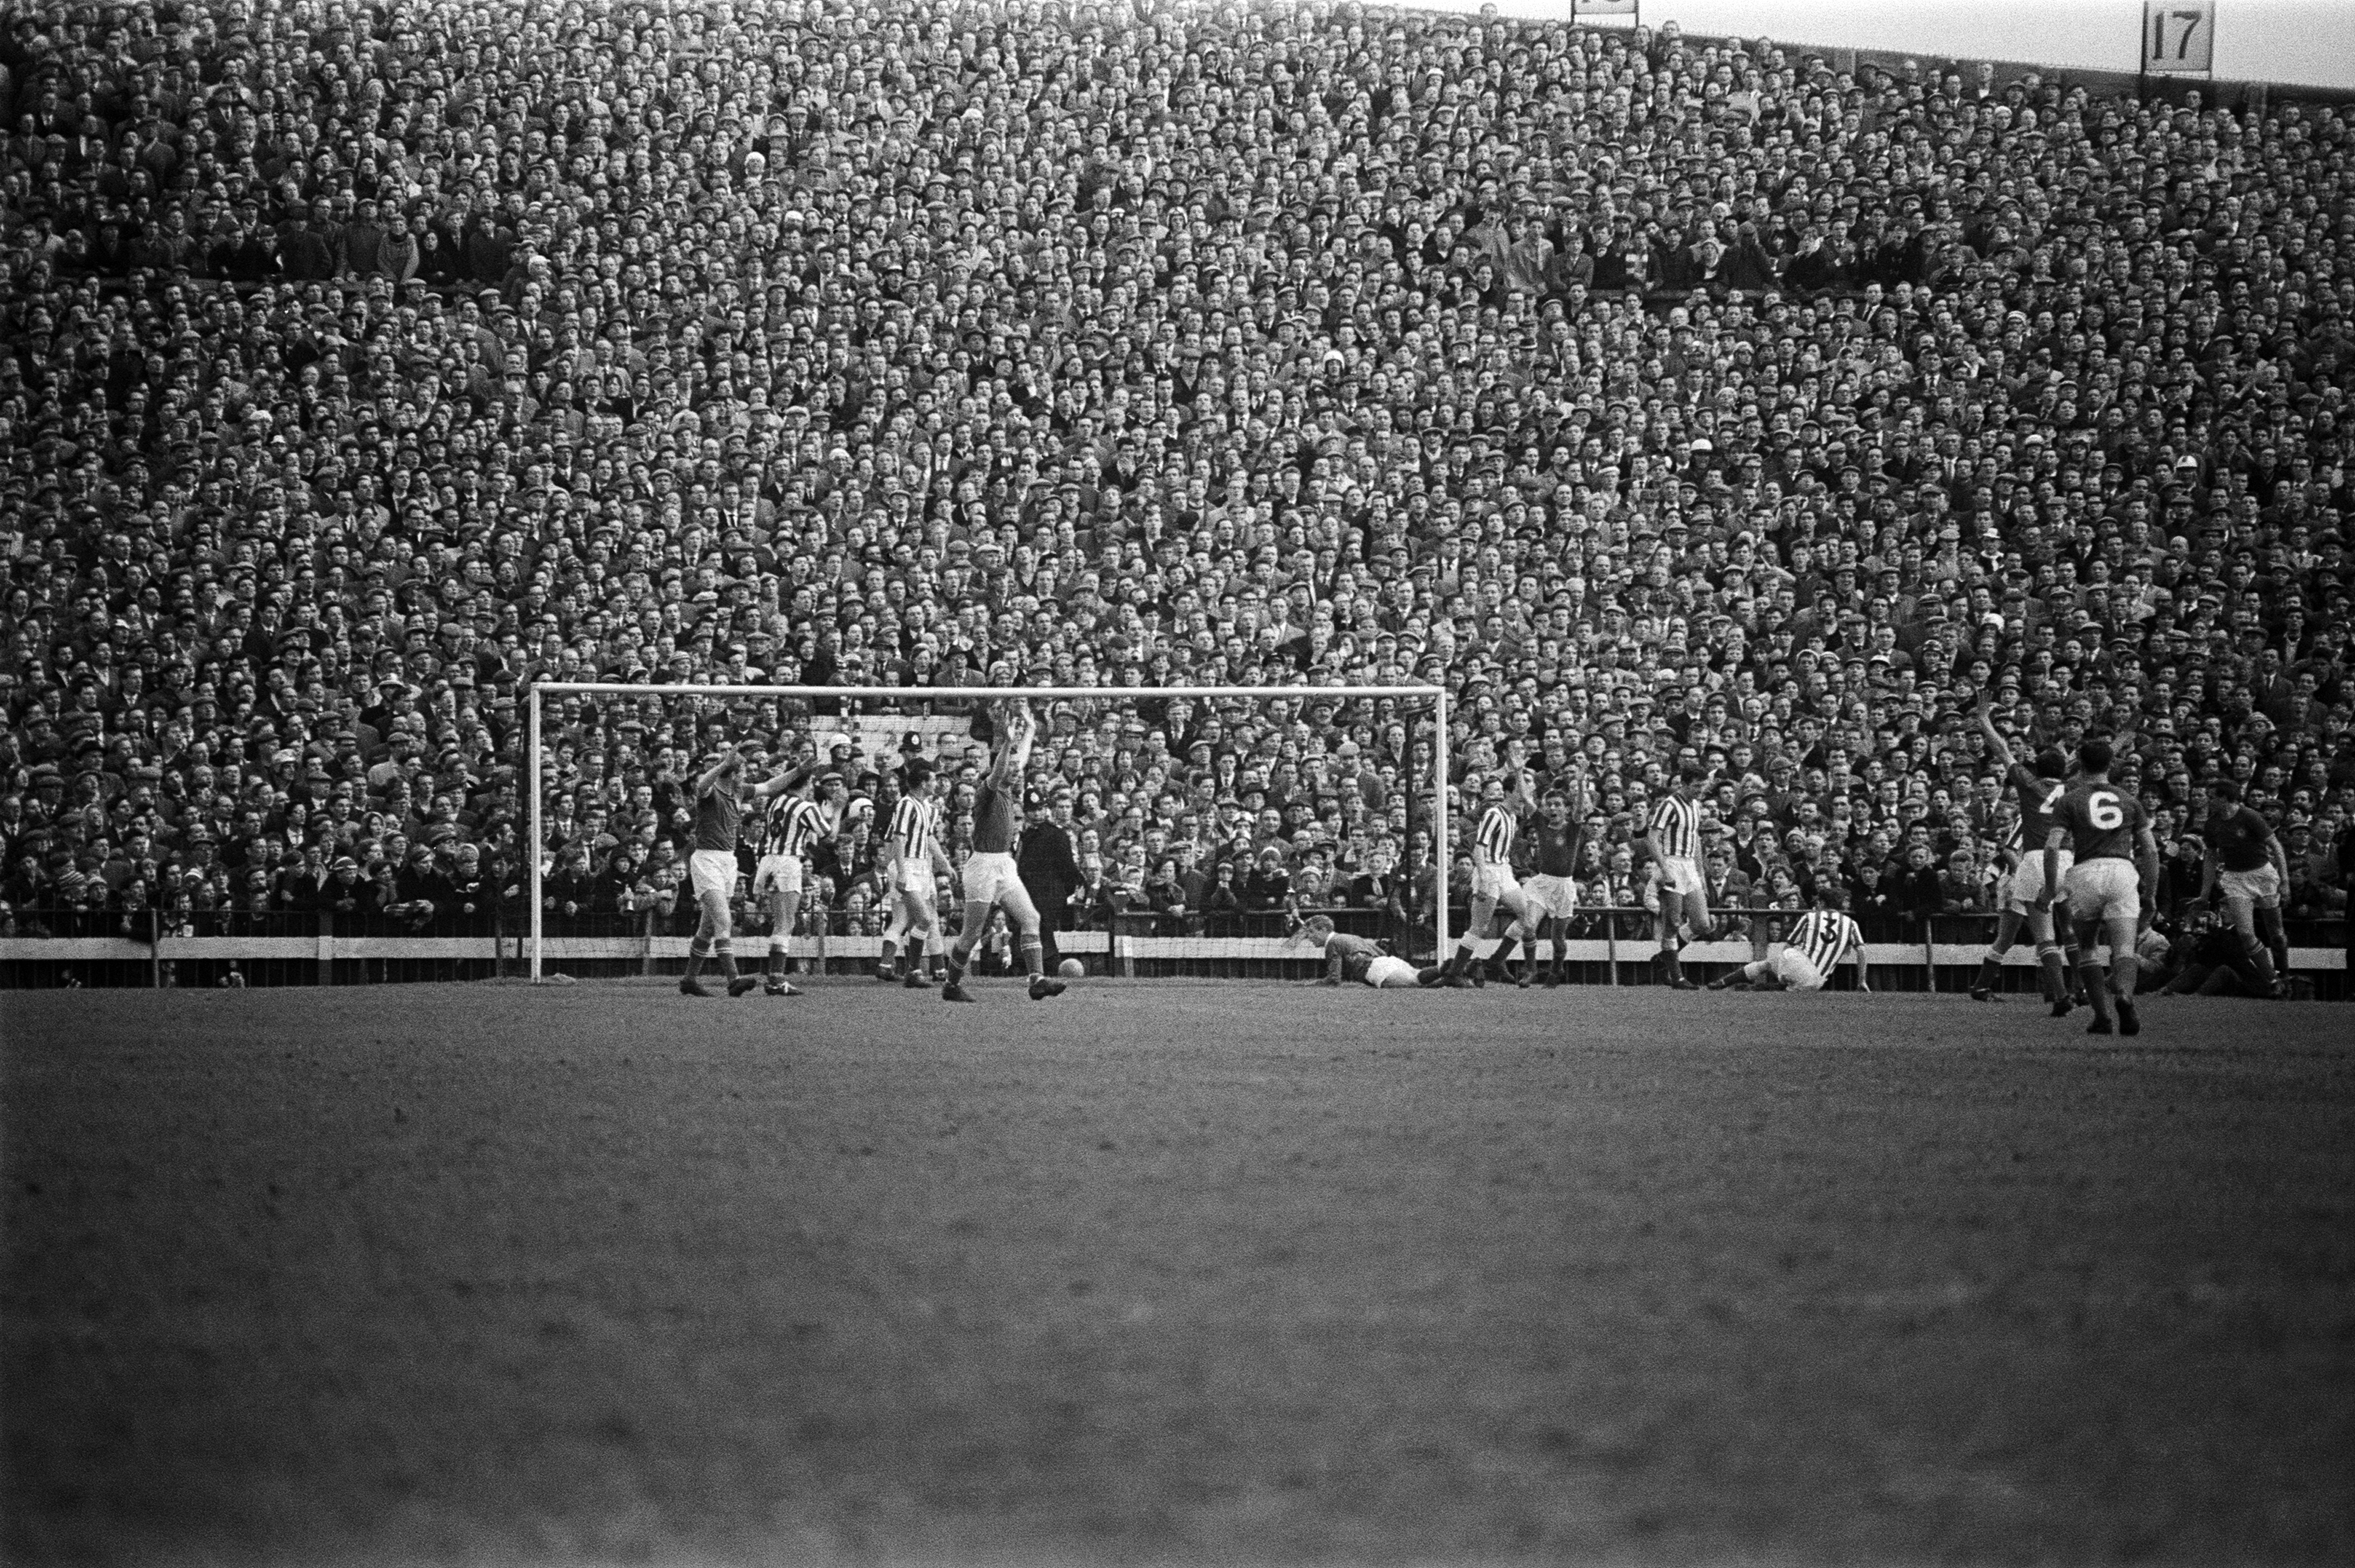 Sunderland 0 v Chelsea 1 Old League Division Two match